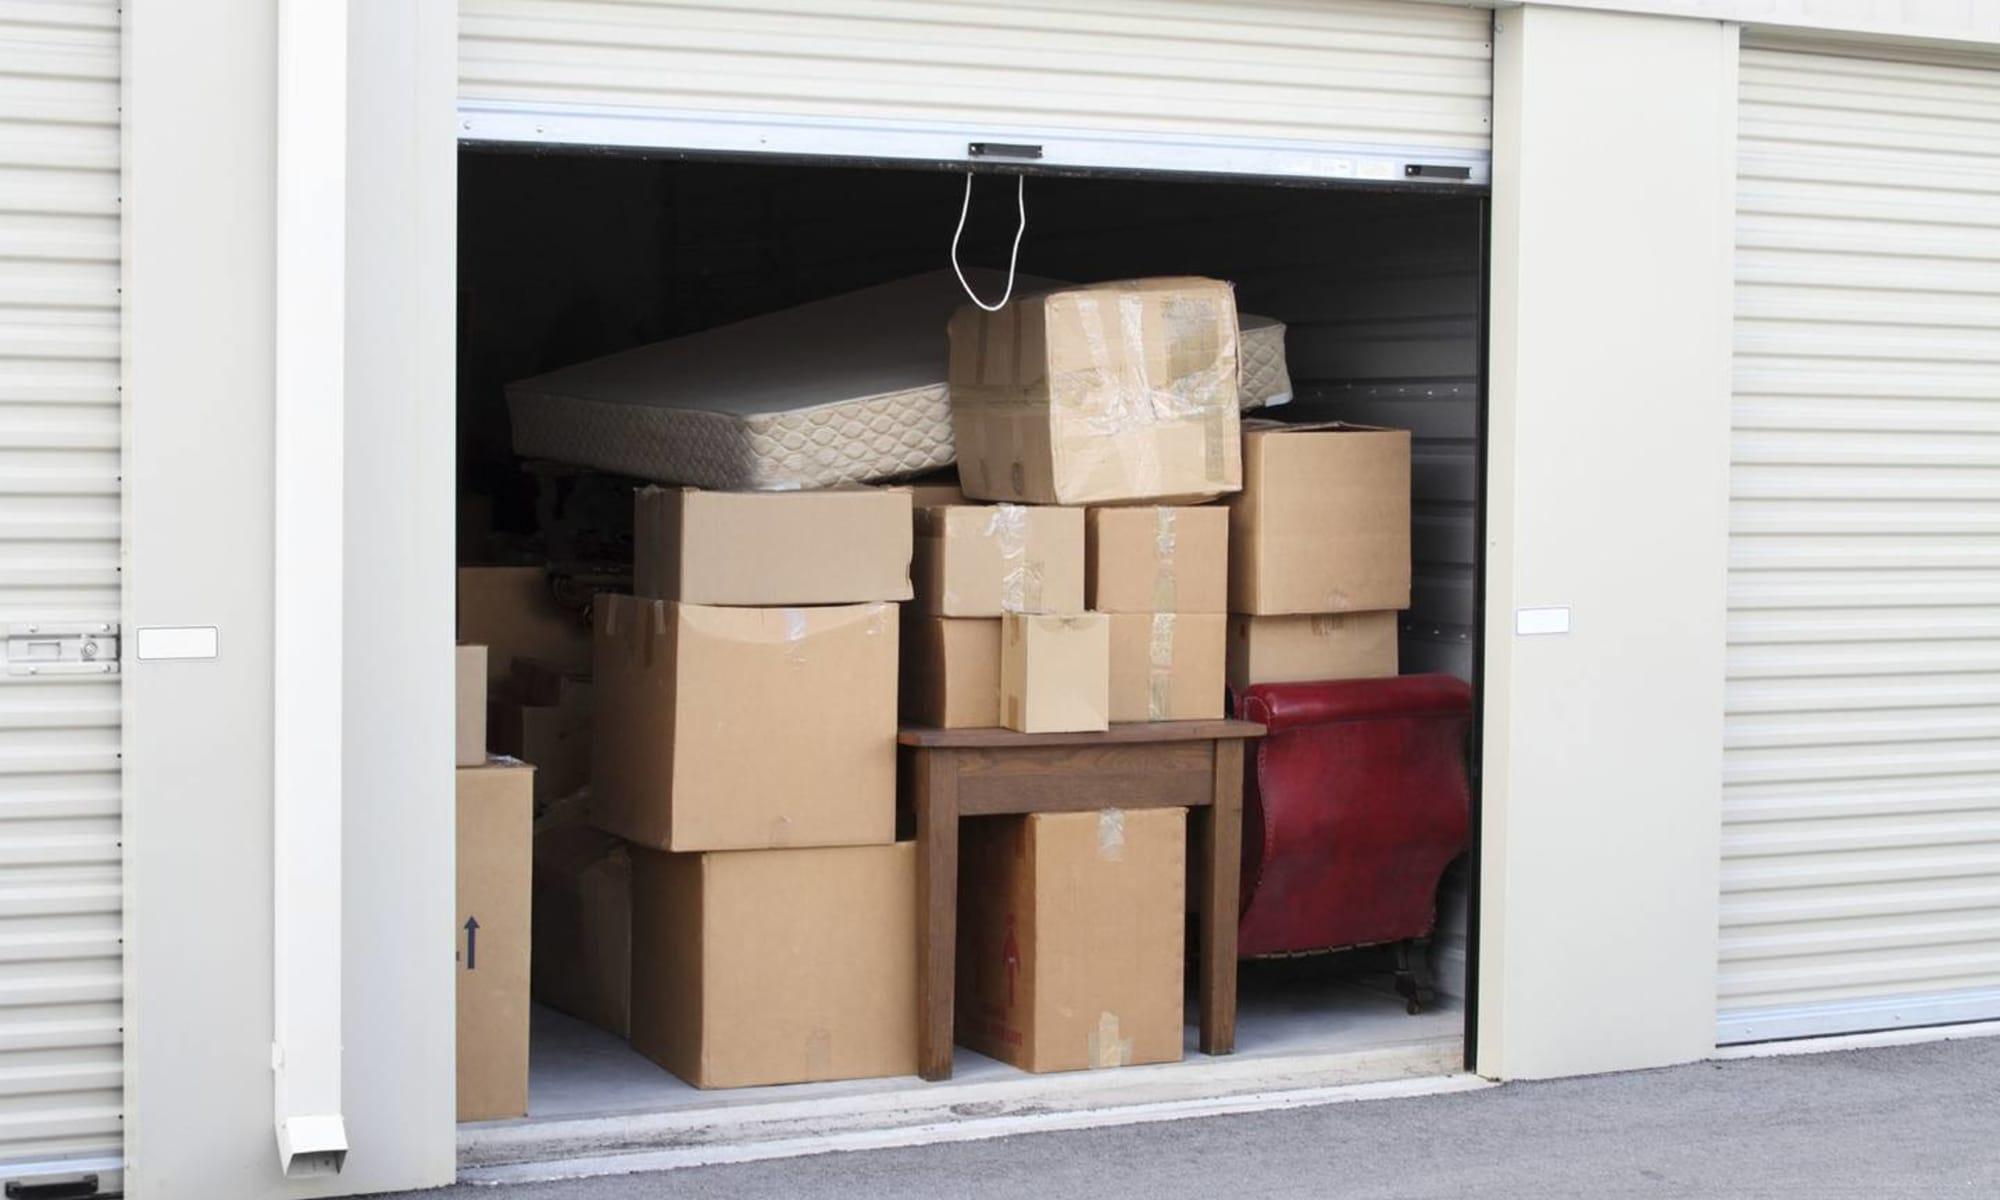 Self storage in Nyack NY